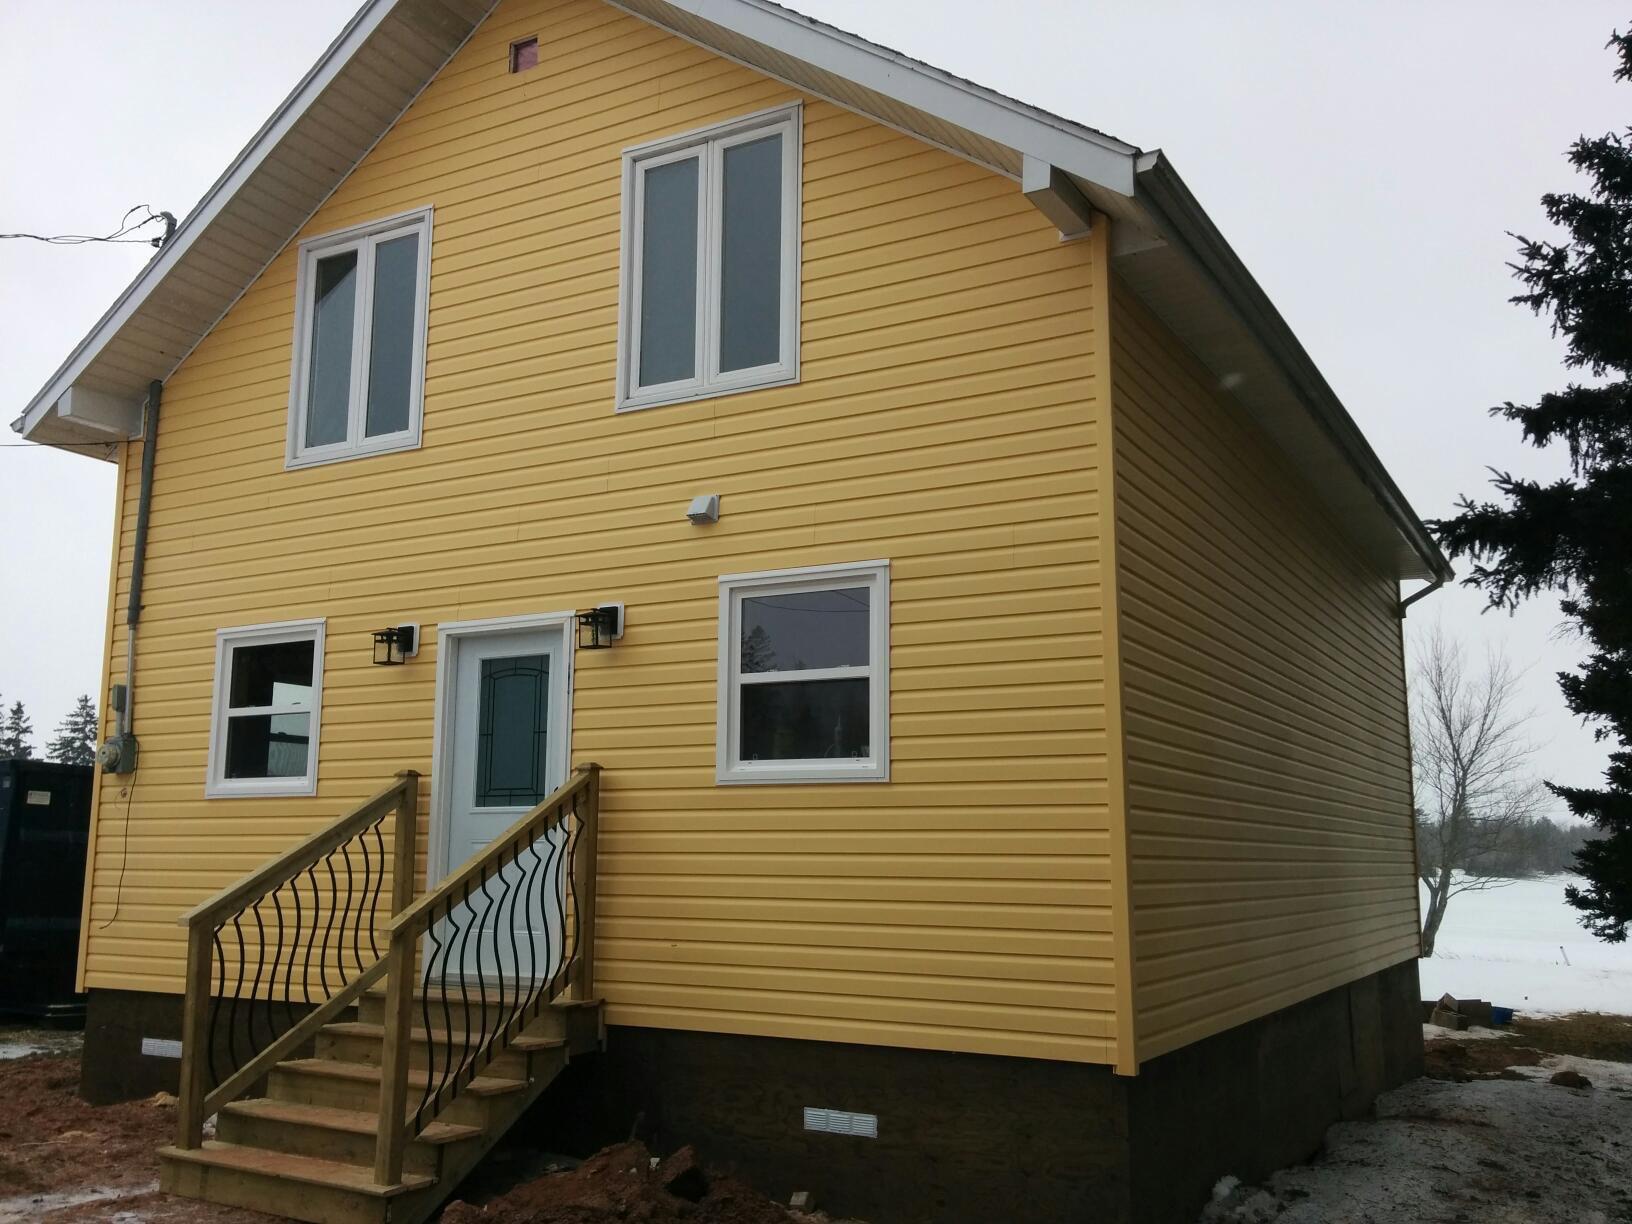 Main Photo: 111 Rainbow Drive in Tarantum: House for sale